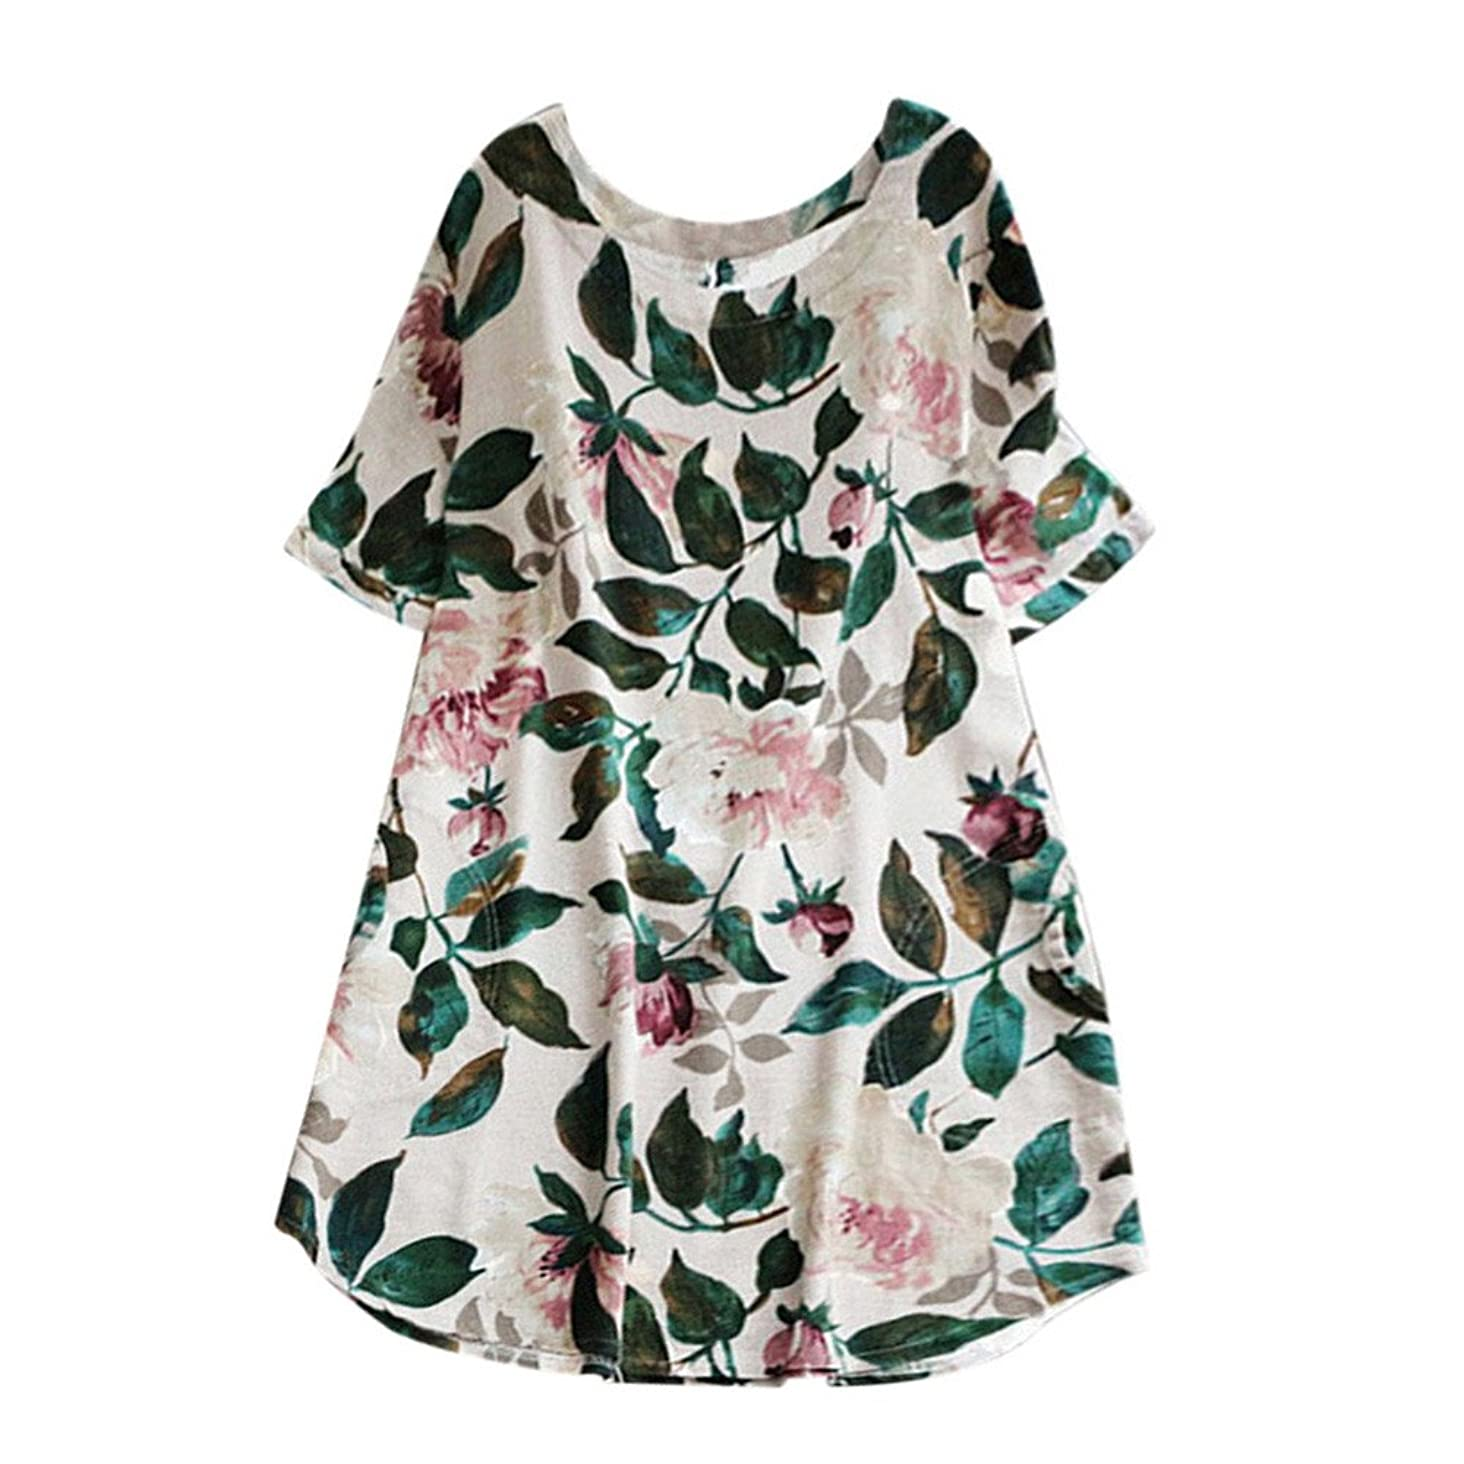 Respctful?Women Short Sleeve Floral Printed Cotton Linen Mini Dress for Summer Plus Size Party Long Sleeve Dress